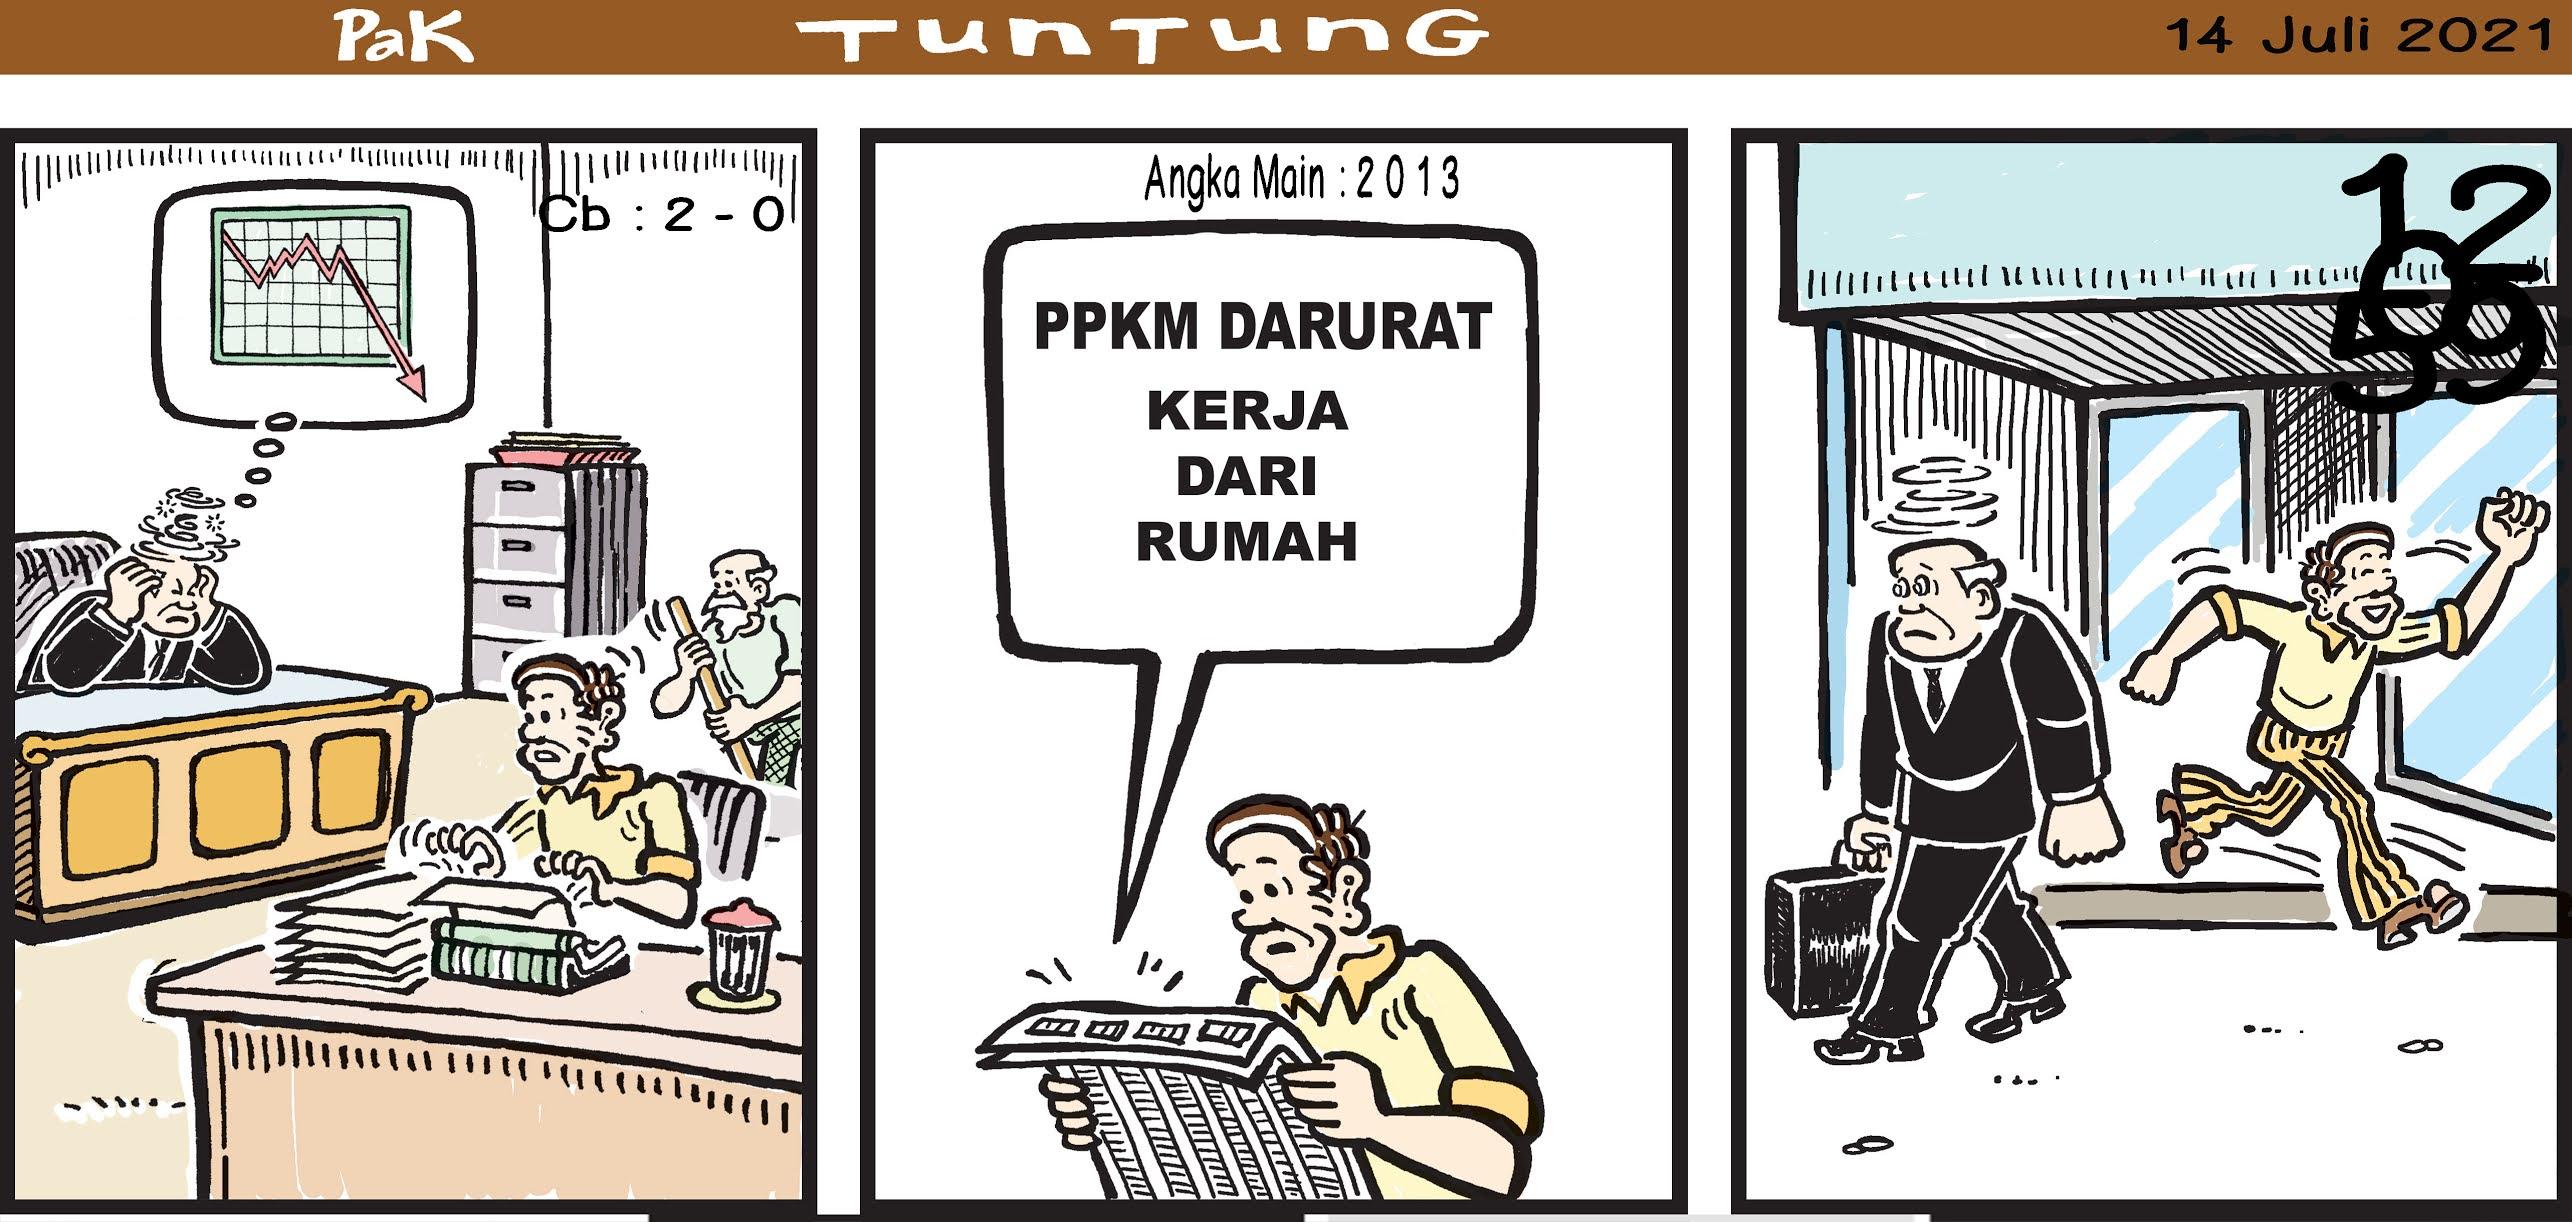 Prediksi Pak Tuntung Sdy Rabu 14 juli 2021